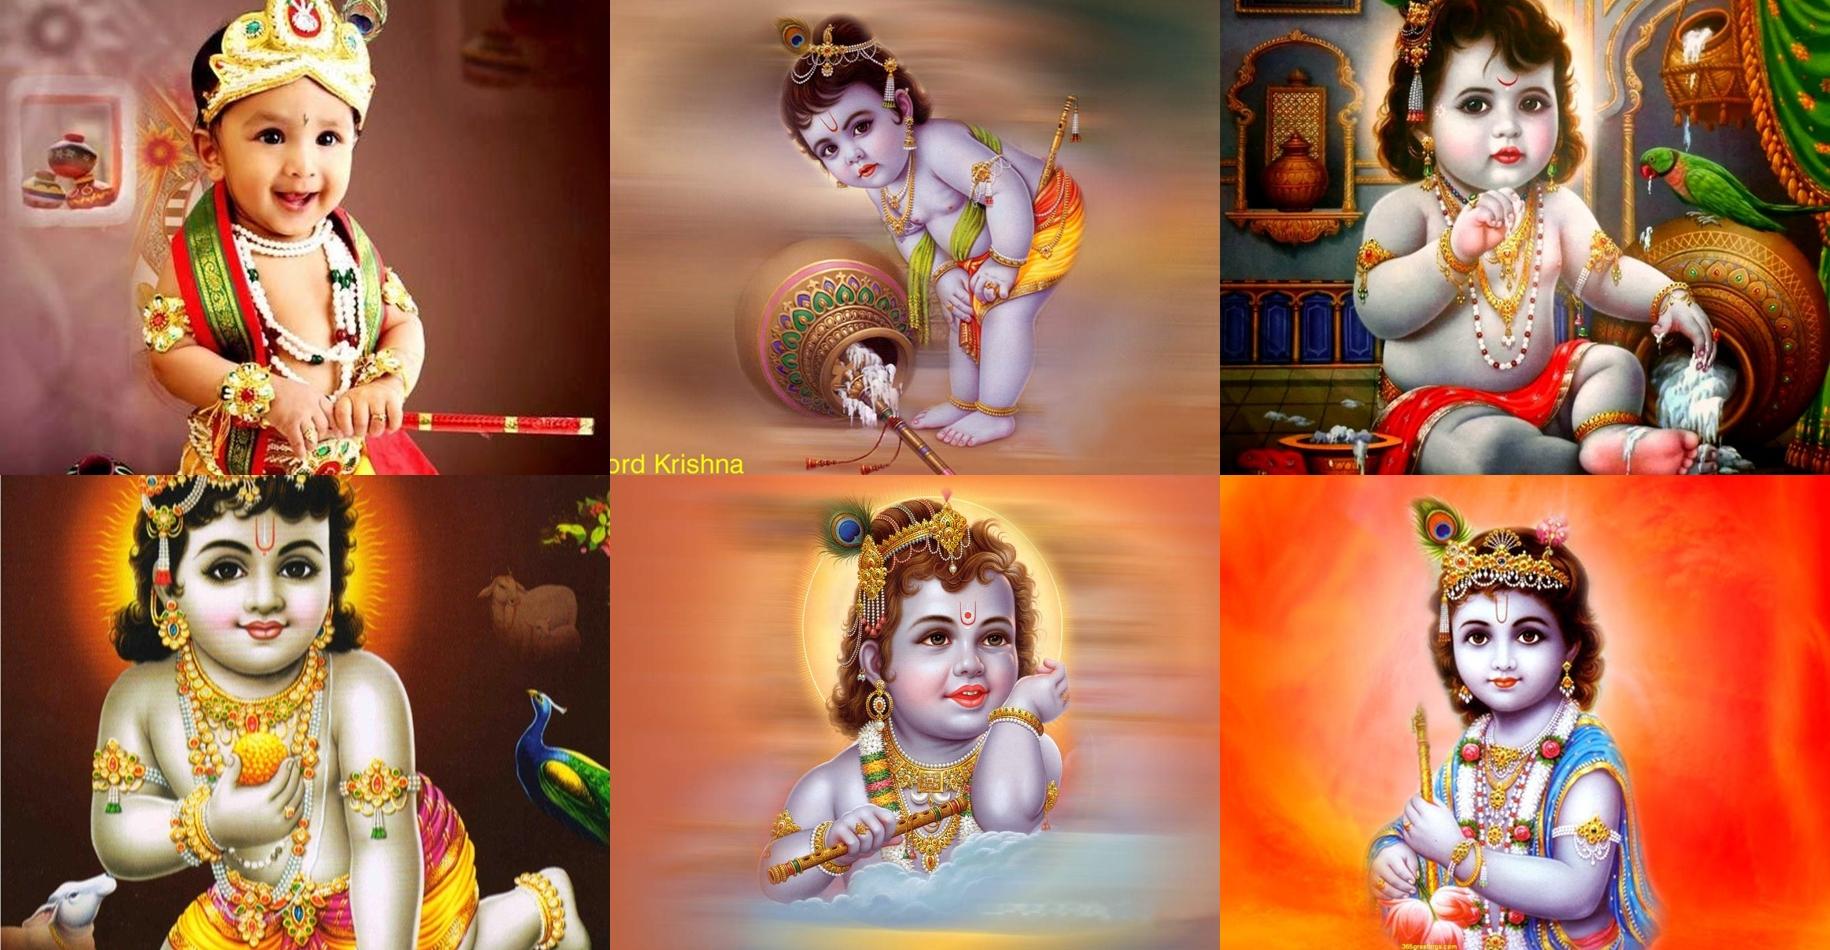 Krishna Images, Lord Krishna Images 2016, Happy Krishnastami - Shri Krishna Images For Whatsapp Dp - HD Wallpaper